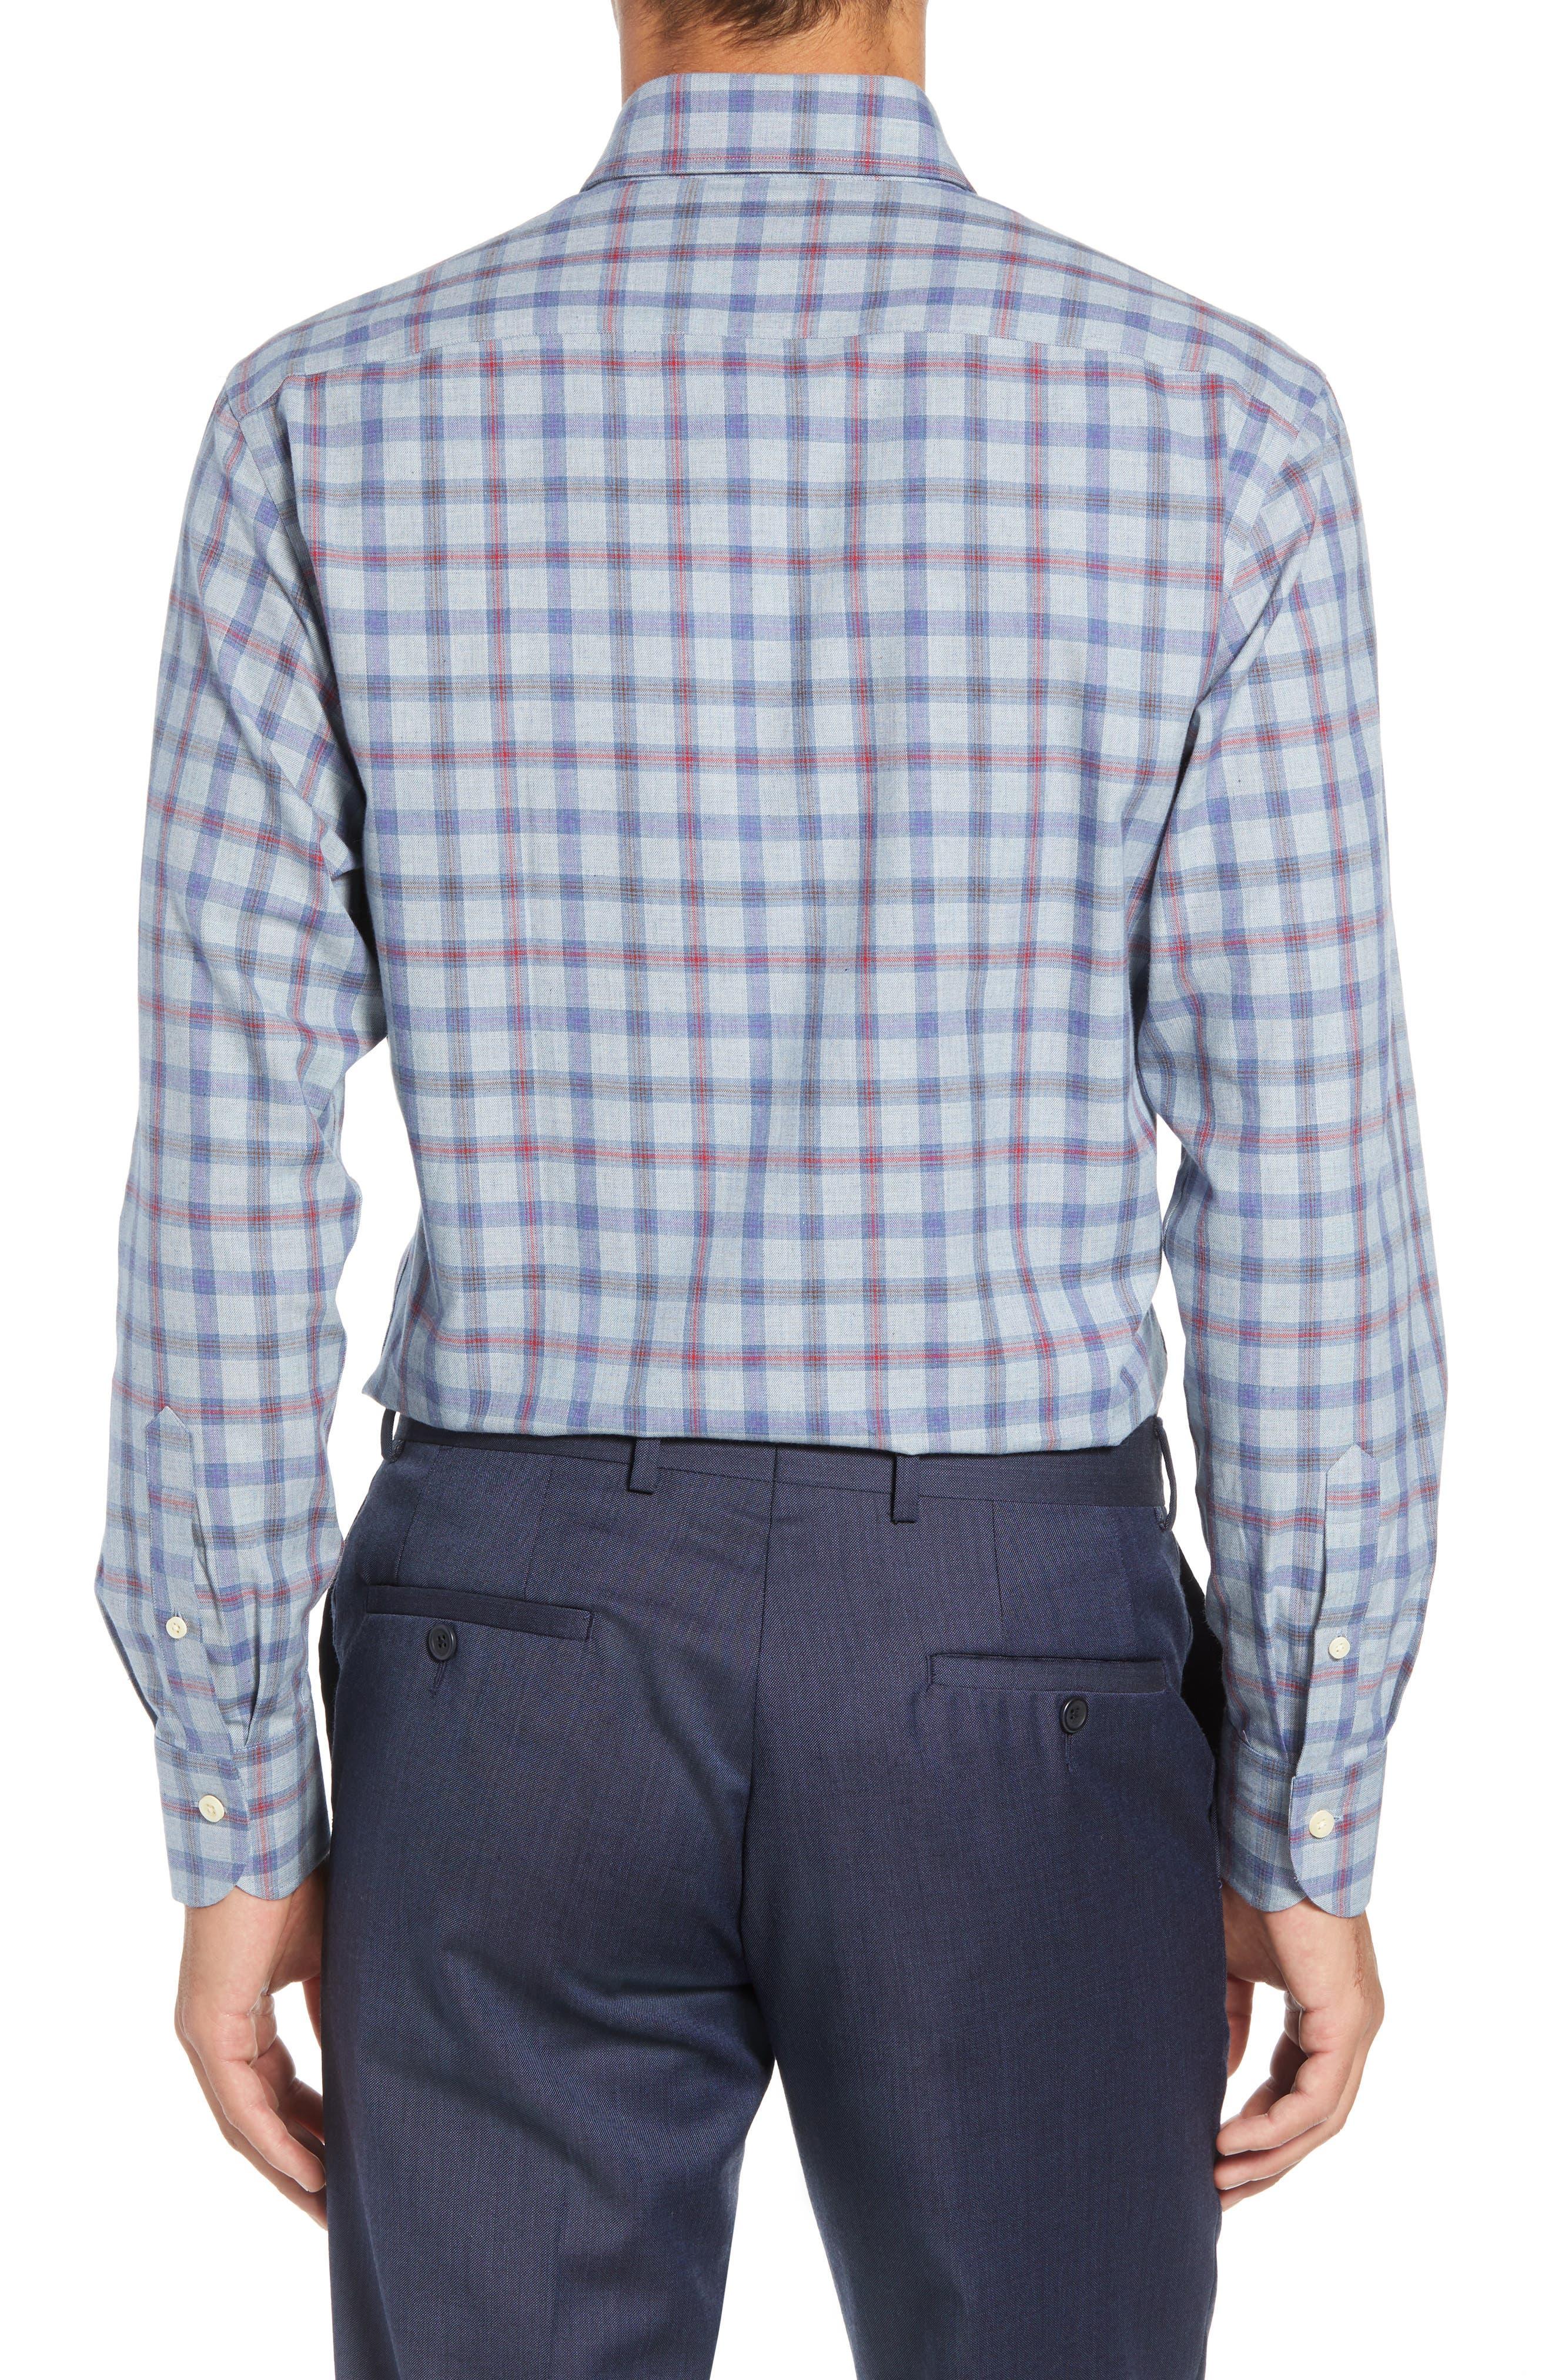 Hilbank Trim Fit Check Dress Shirt,                             Alternate thumbnail 3, color,                             CADET BLUE